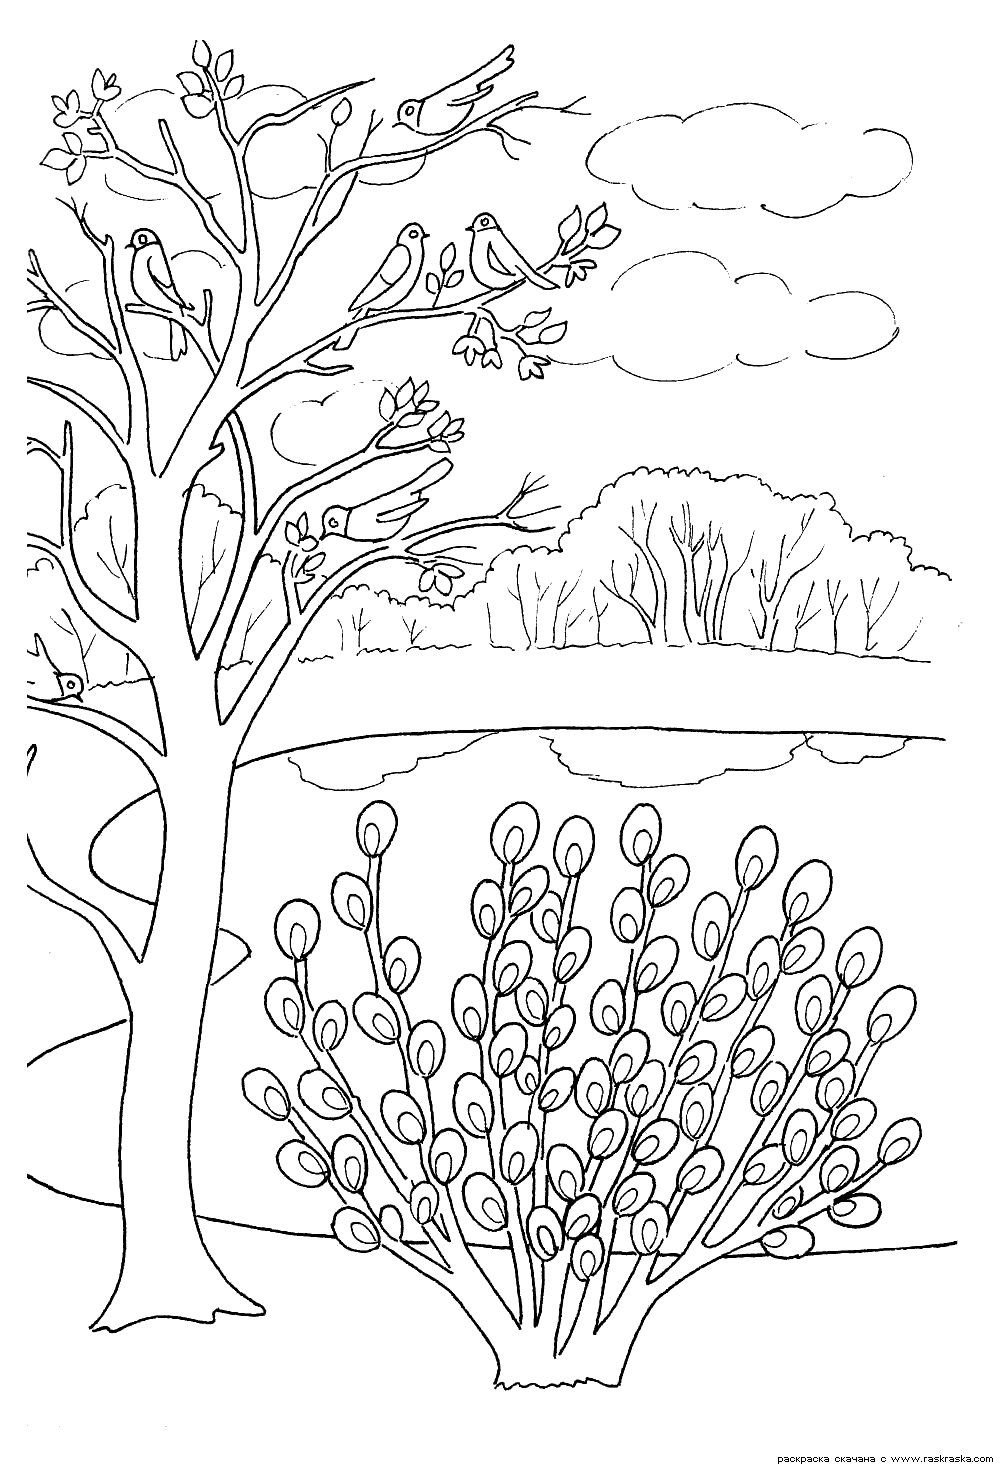 Farben Von Blumen Pflanzen Natur Kinder Druck Raquo Page 8 Coloring Pages Colouring Pages Color